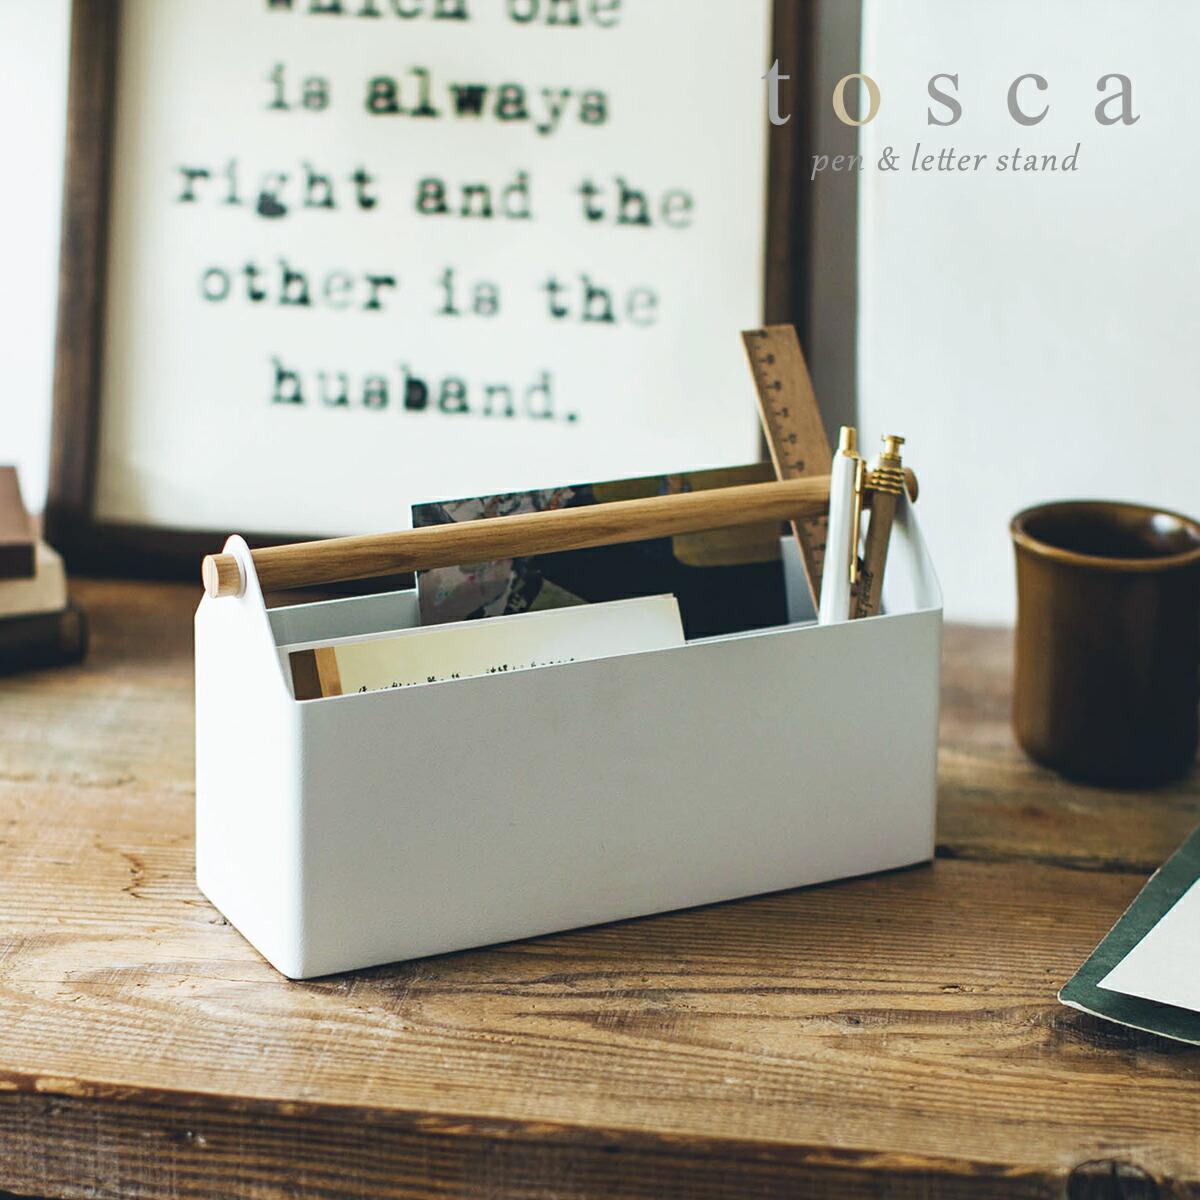 tosca トスカ 収納 レタースタンド ペン立て ペンスタンド デスク